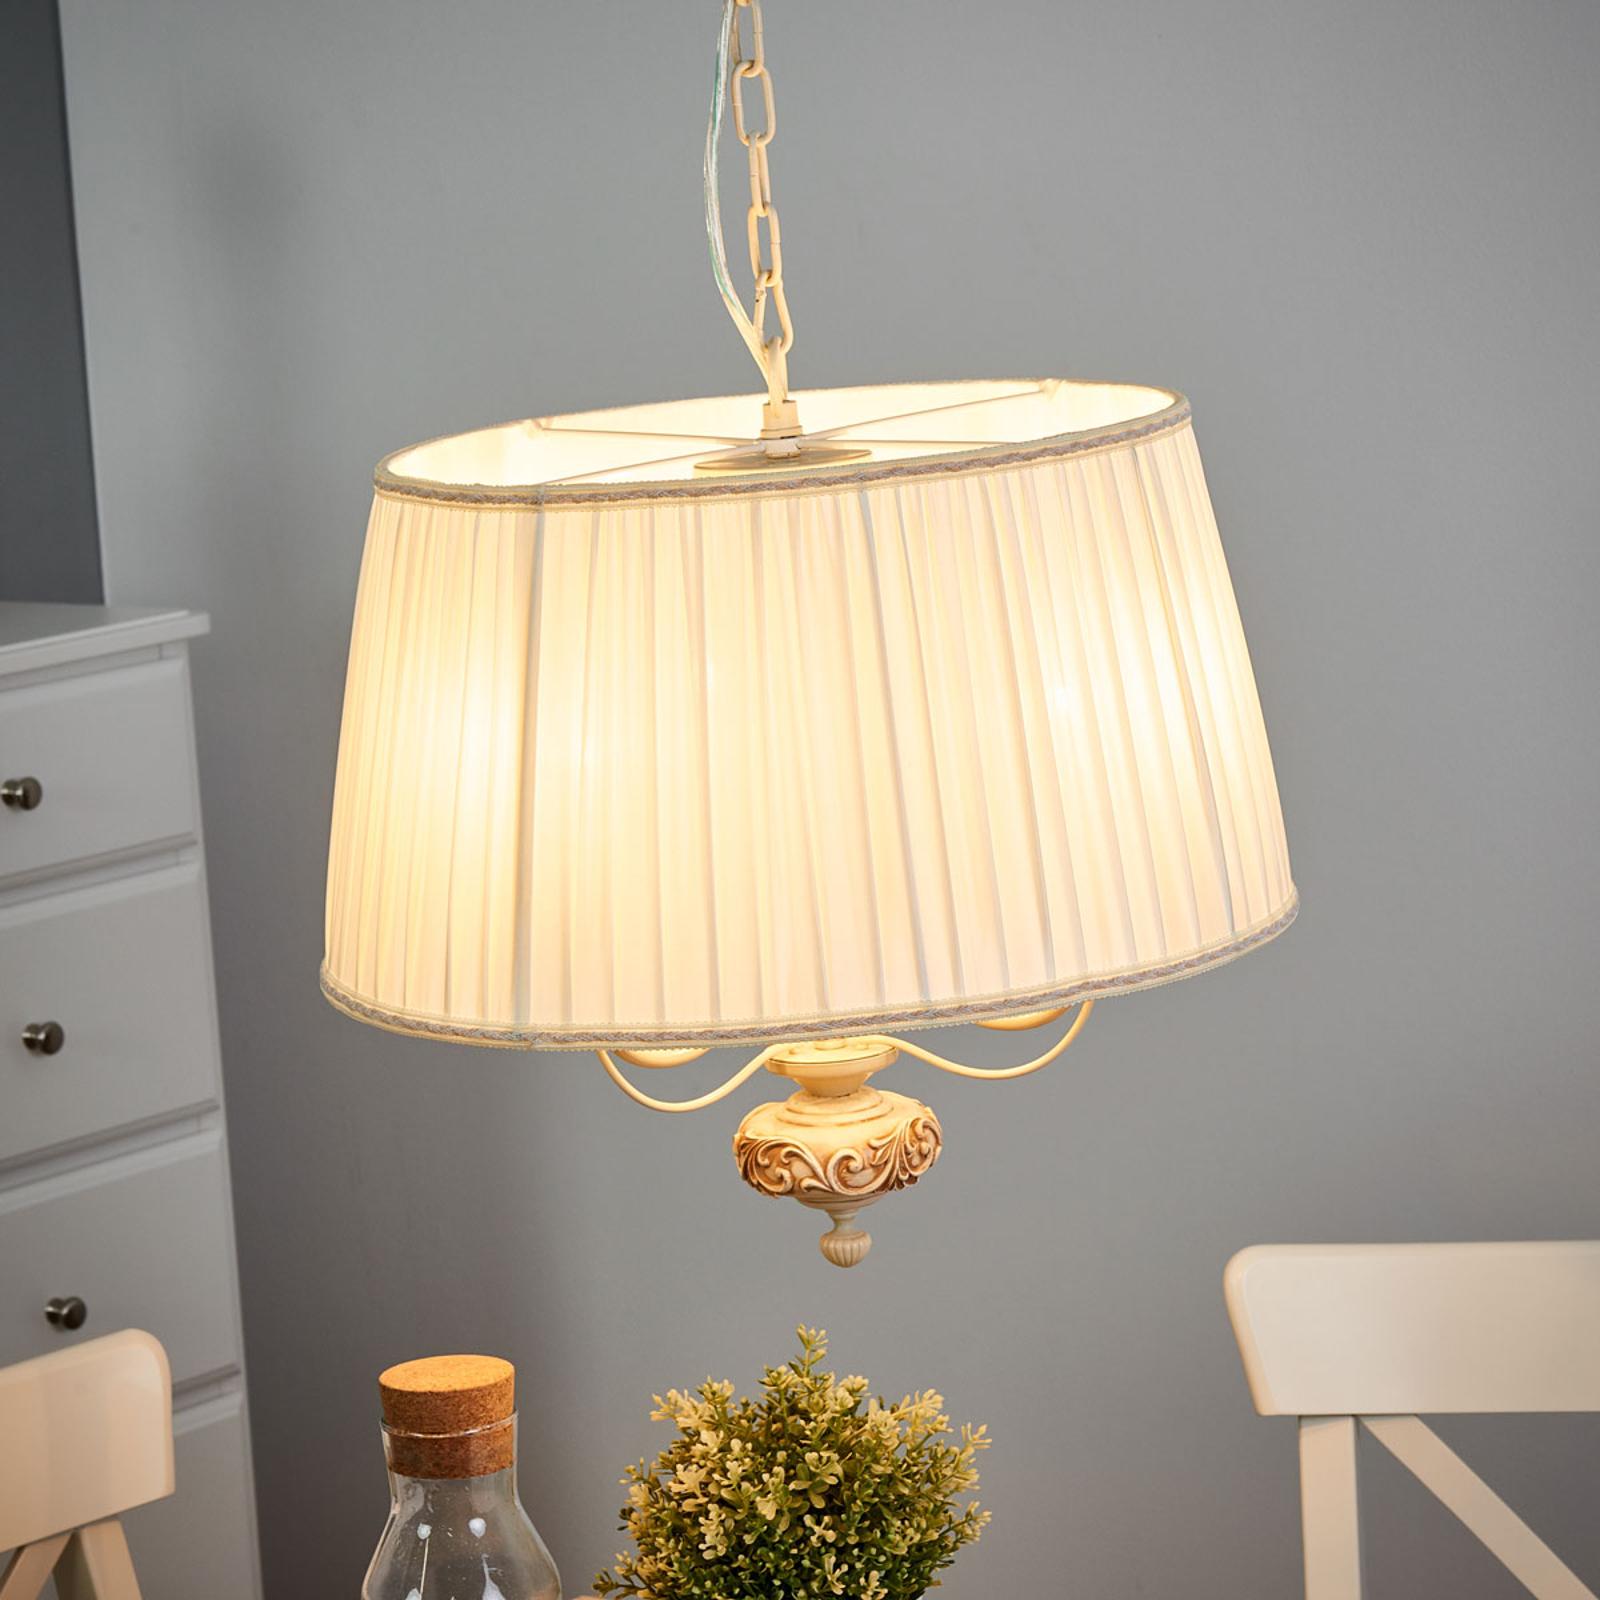 Kremowa satynowa lampa wisząca Olivia